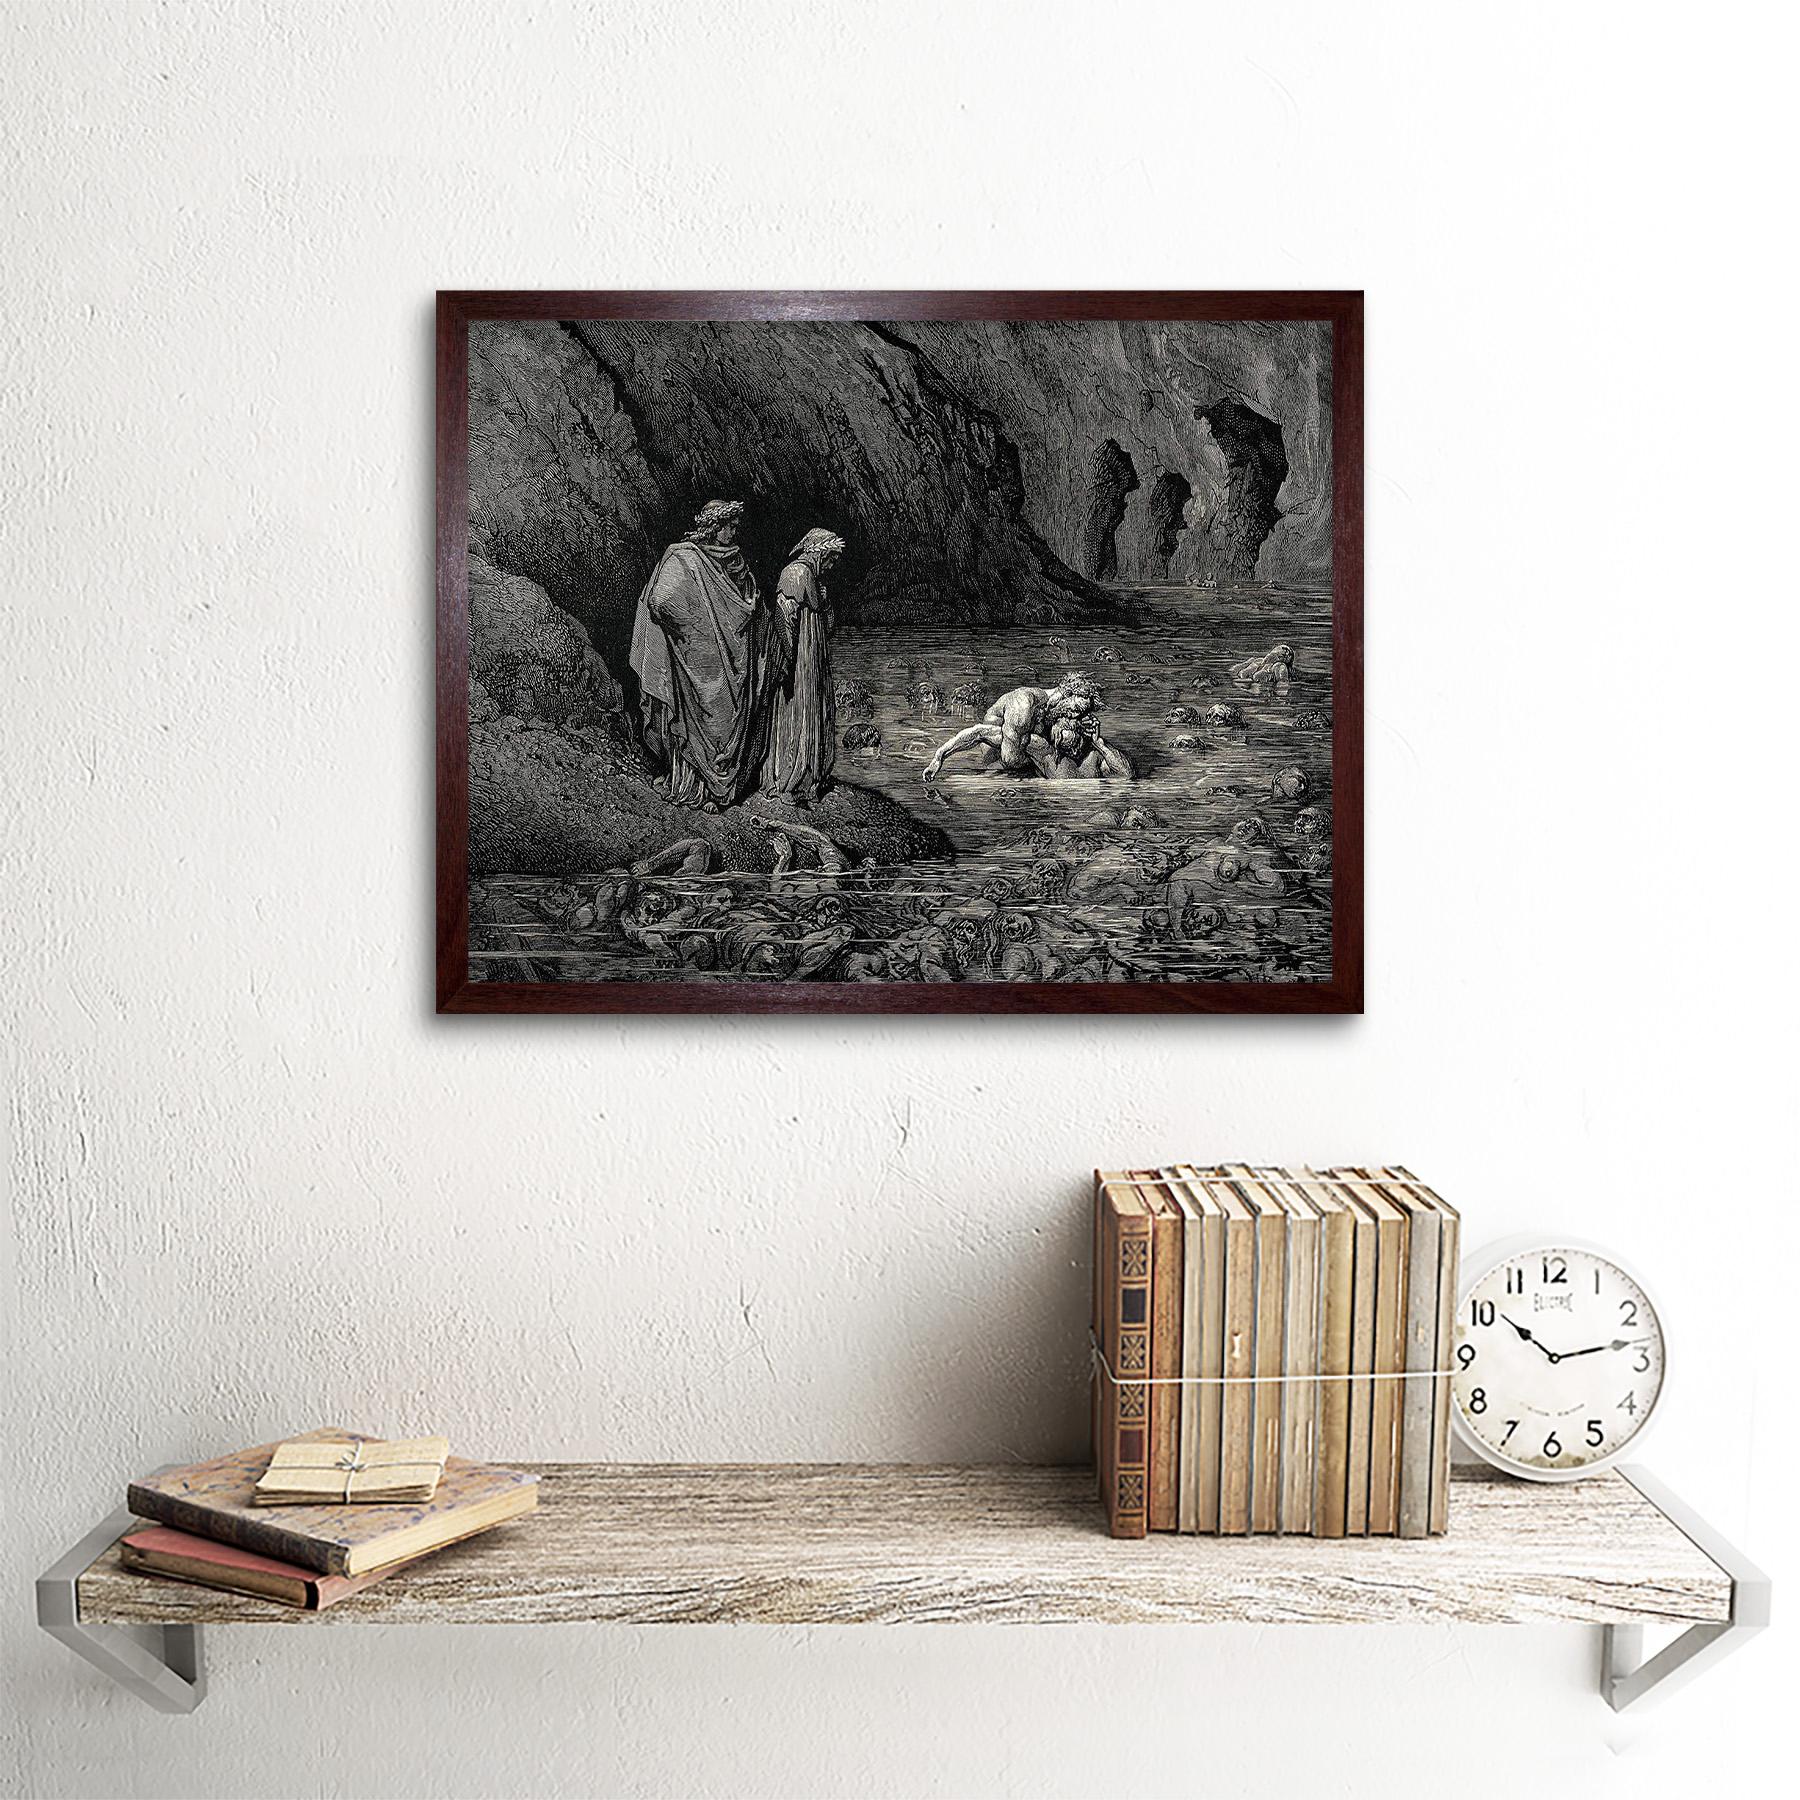 DORE INFERNO CANTO 12 DANTE OLD MASTER FRAMED ART PRINT MOUNT B12X300